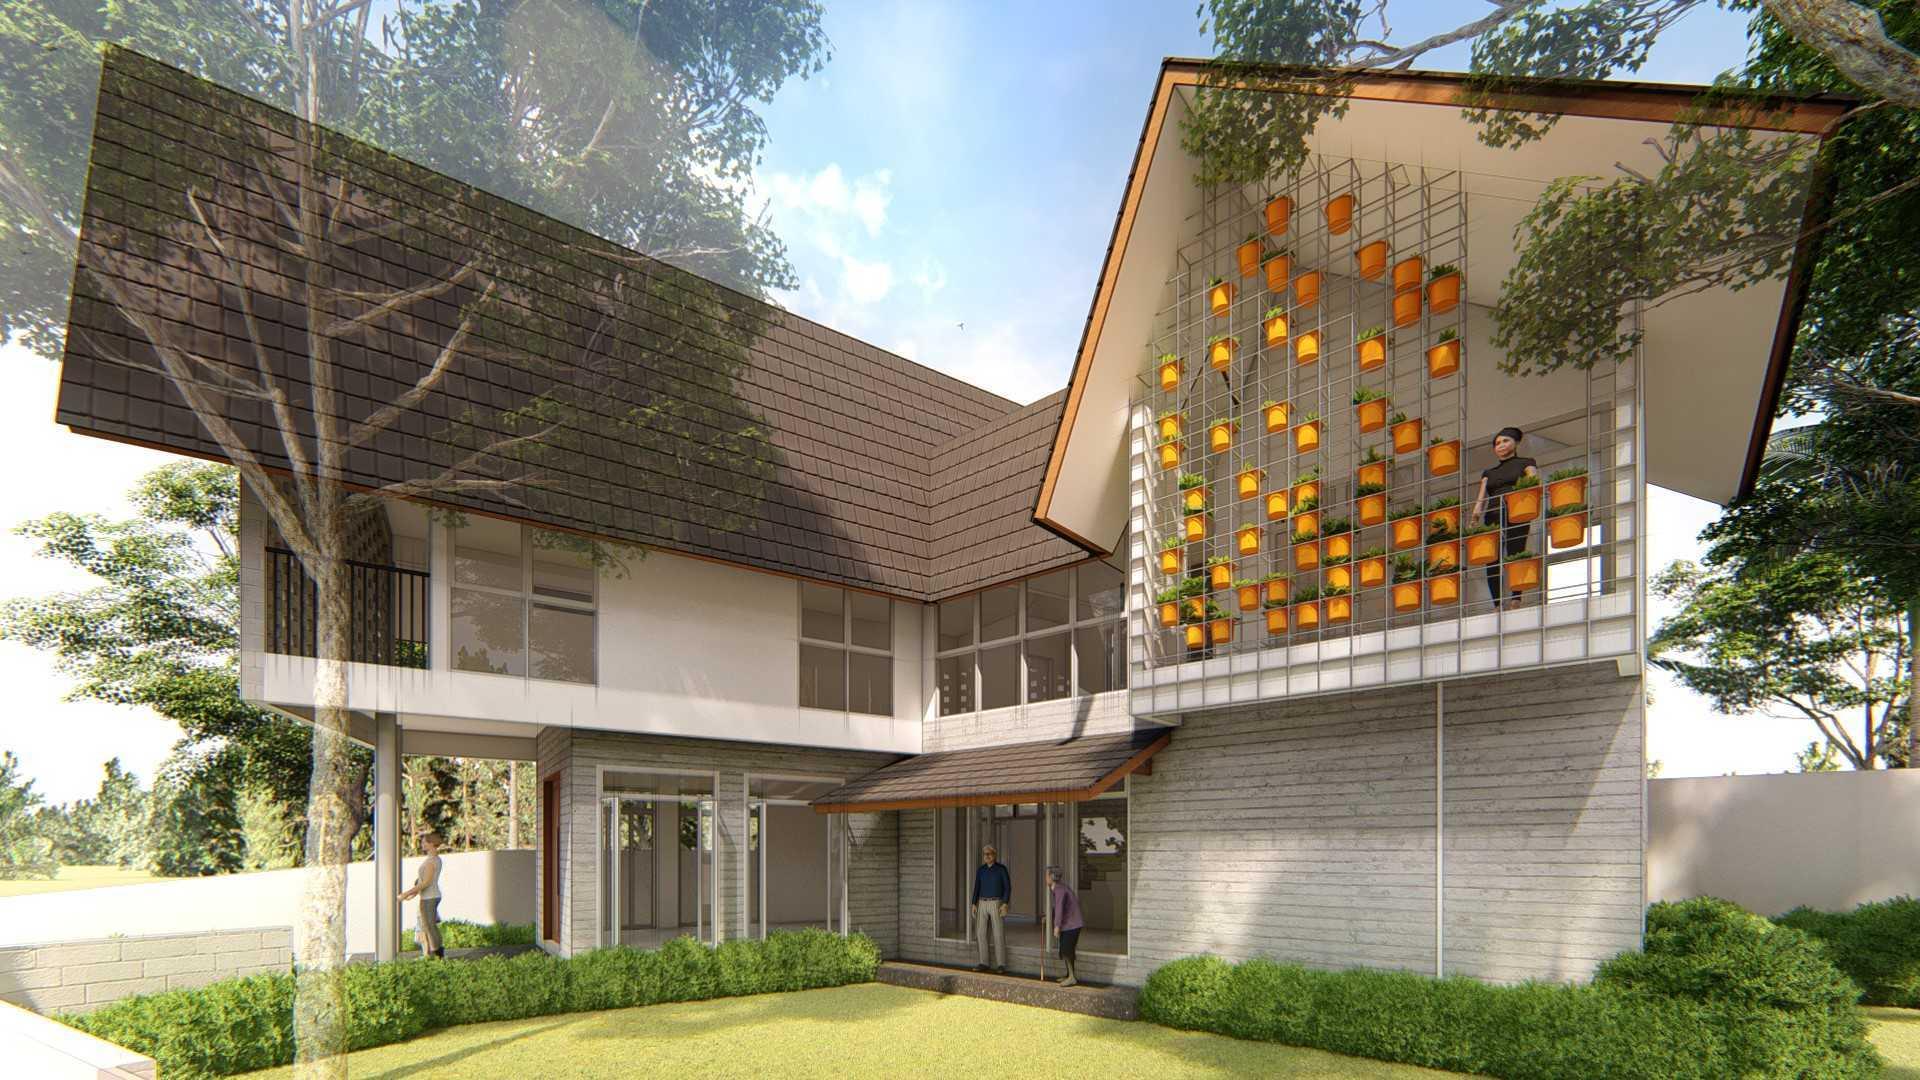 Slight Architect Cinka Tagulandang, Kabupaten Siau Tagulandang Biaro, Sulawesi Utara, Indonesia Tagulandang, Kabupaten Siau Tagulandang Biaro, Sulawesi Utara, Indonesia Slight-Architect-Cinka   120183